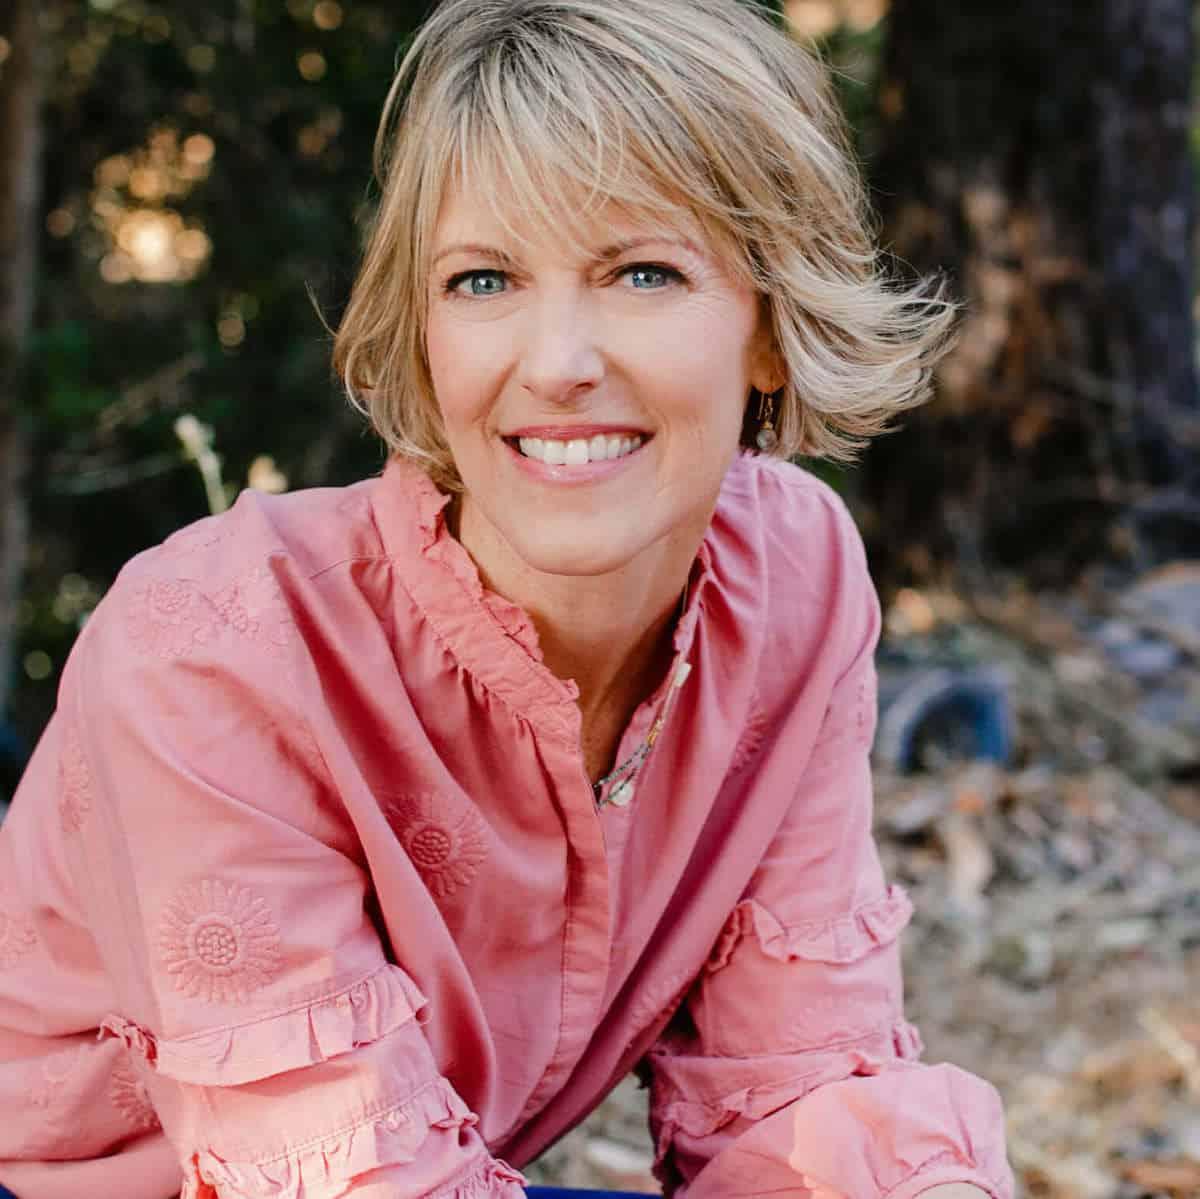 Elizabeth Hunter Diamond, intuitive healer and empath teacher, portrait in pink shirt. Teaches about being an empath.